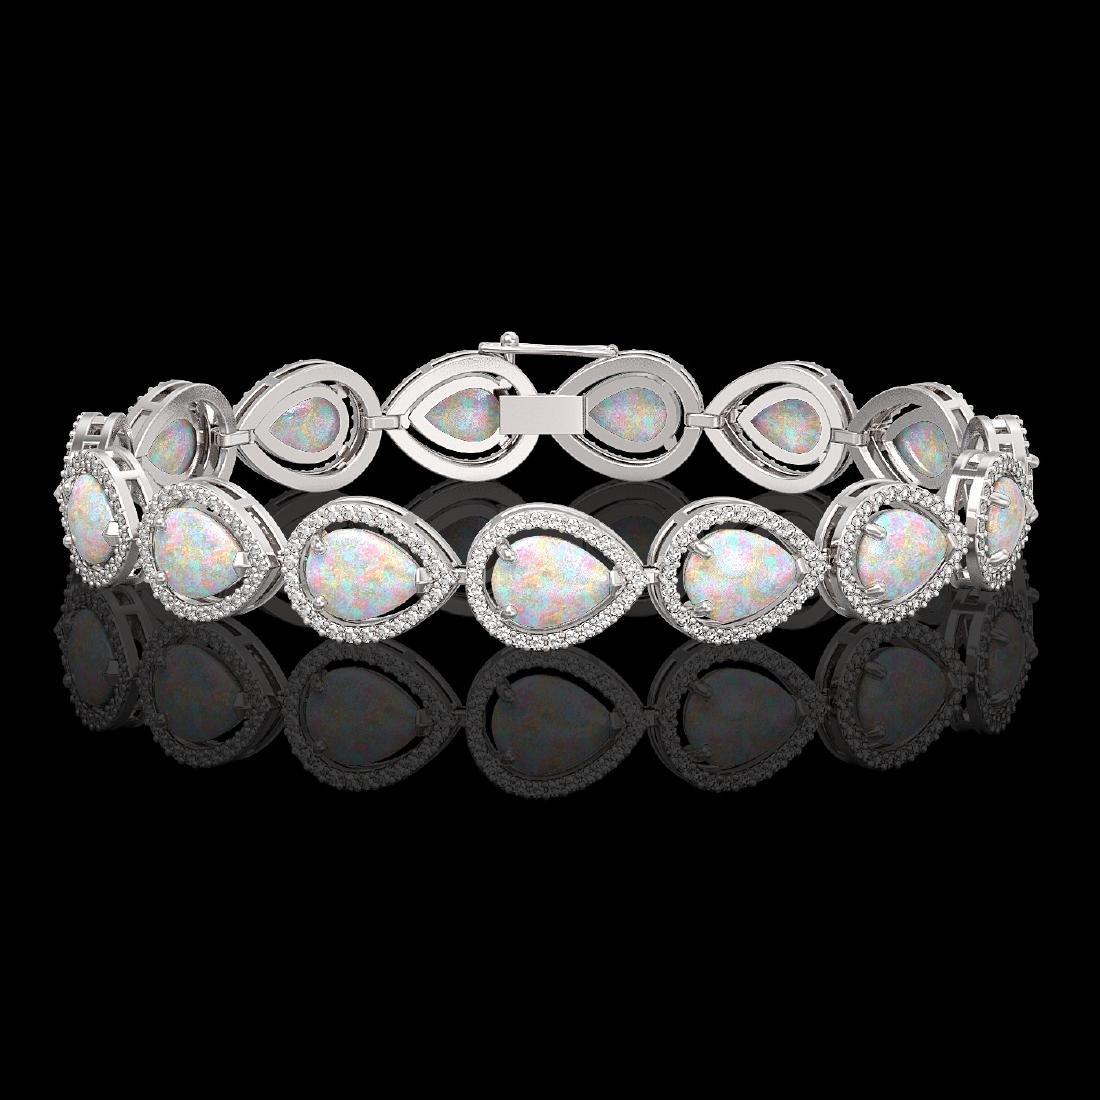 17.15 CTW Opal & Diamond Halo Bracelet 10K White Gold